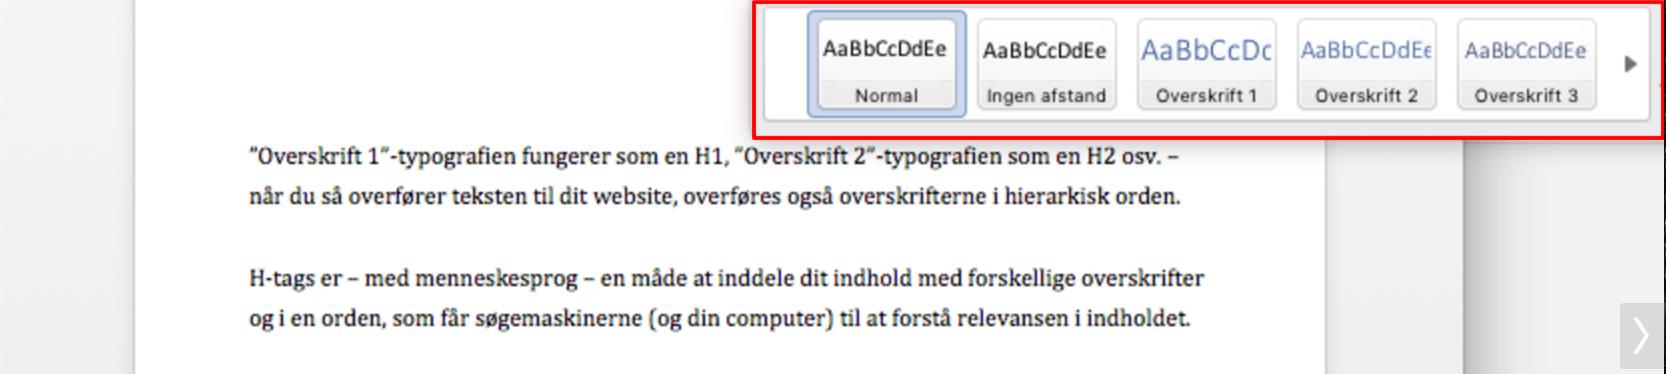 Billedet illustrerer typografierne i Office Word, som også kan benyttes som H-tags (HTML)